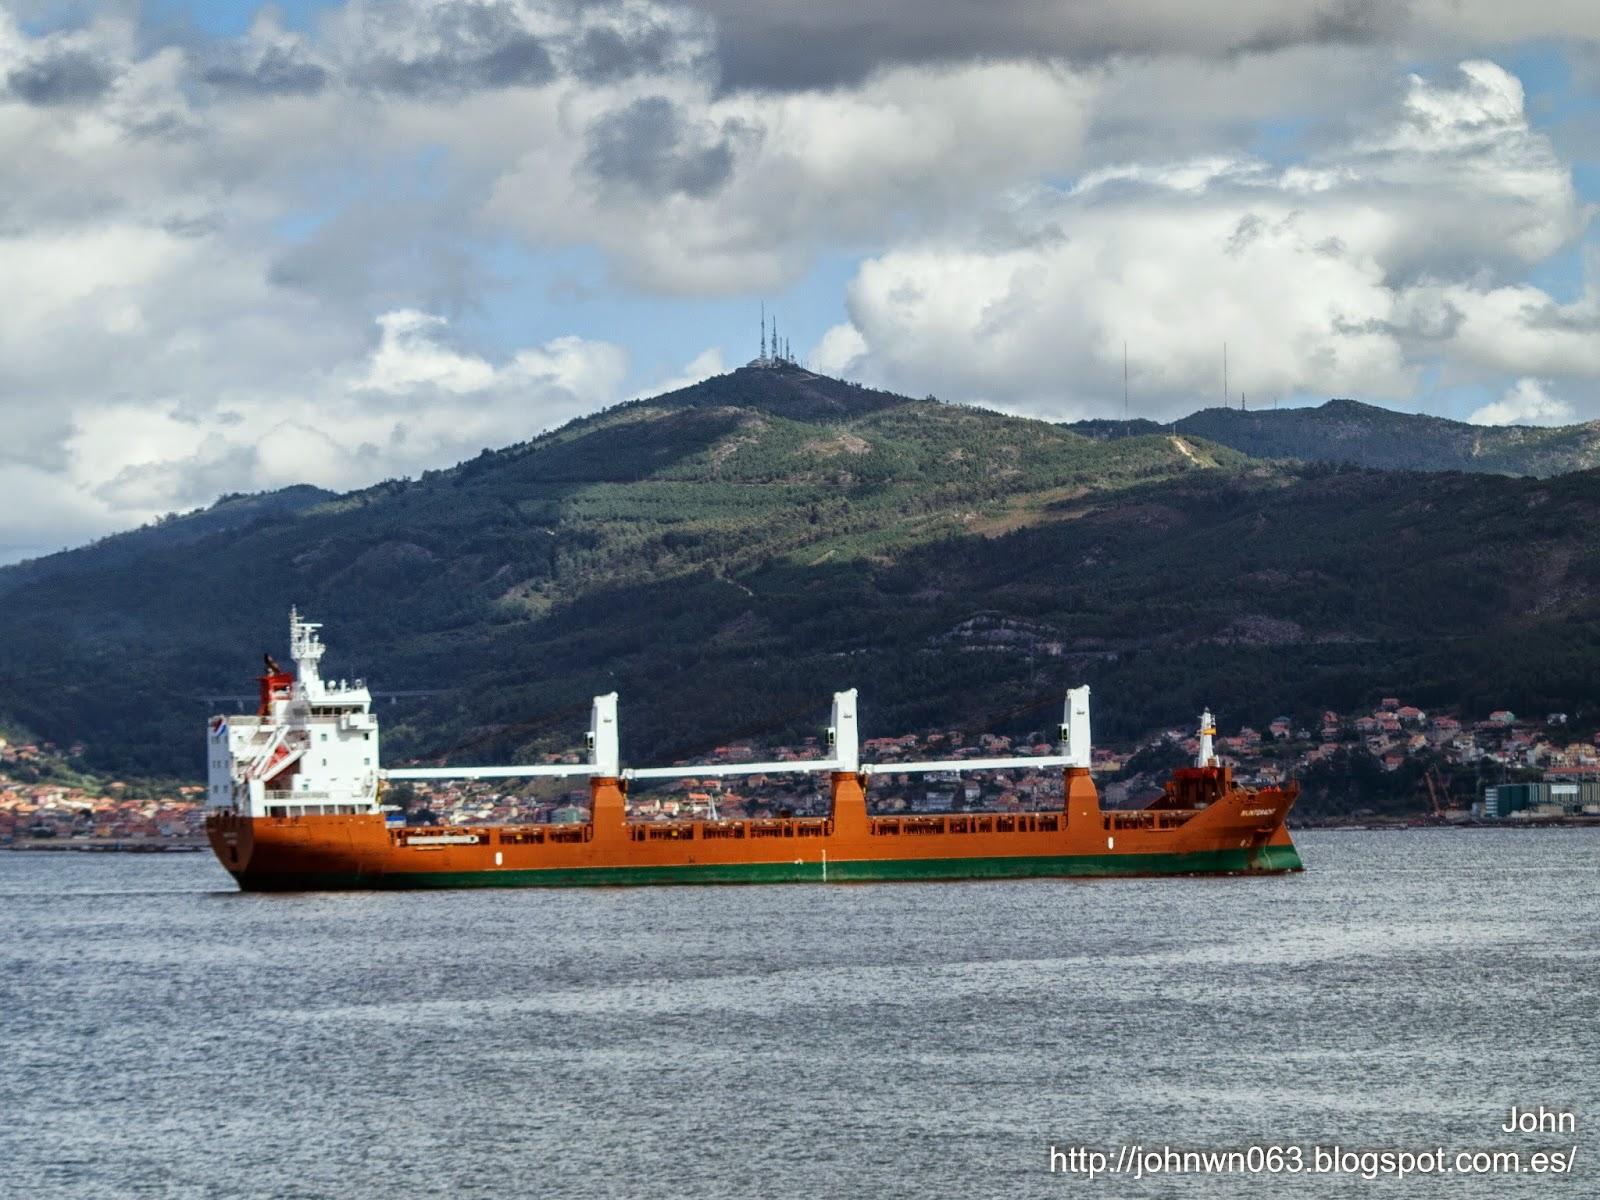 fotos de barcos, imagenes de barcos, muntgracht, carga general, vigo